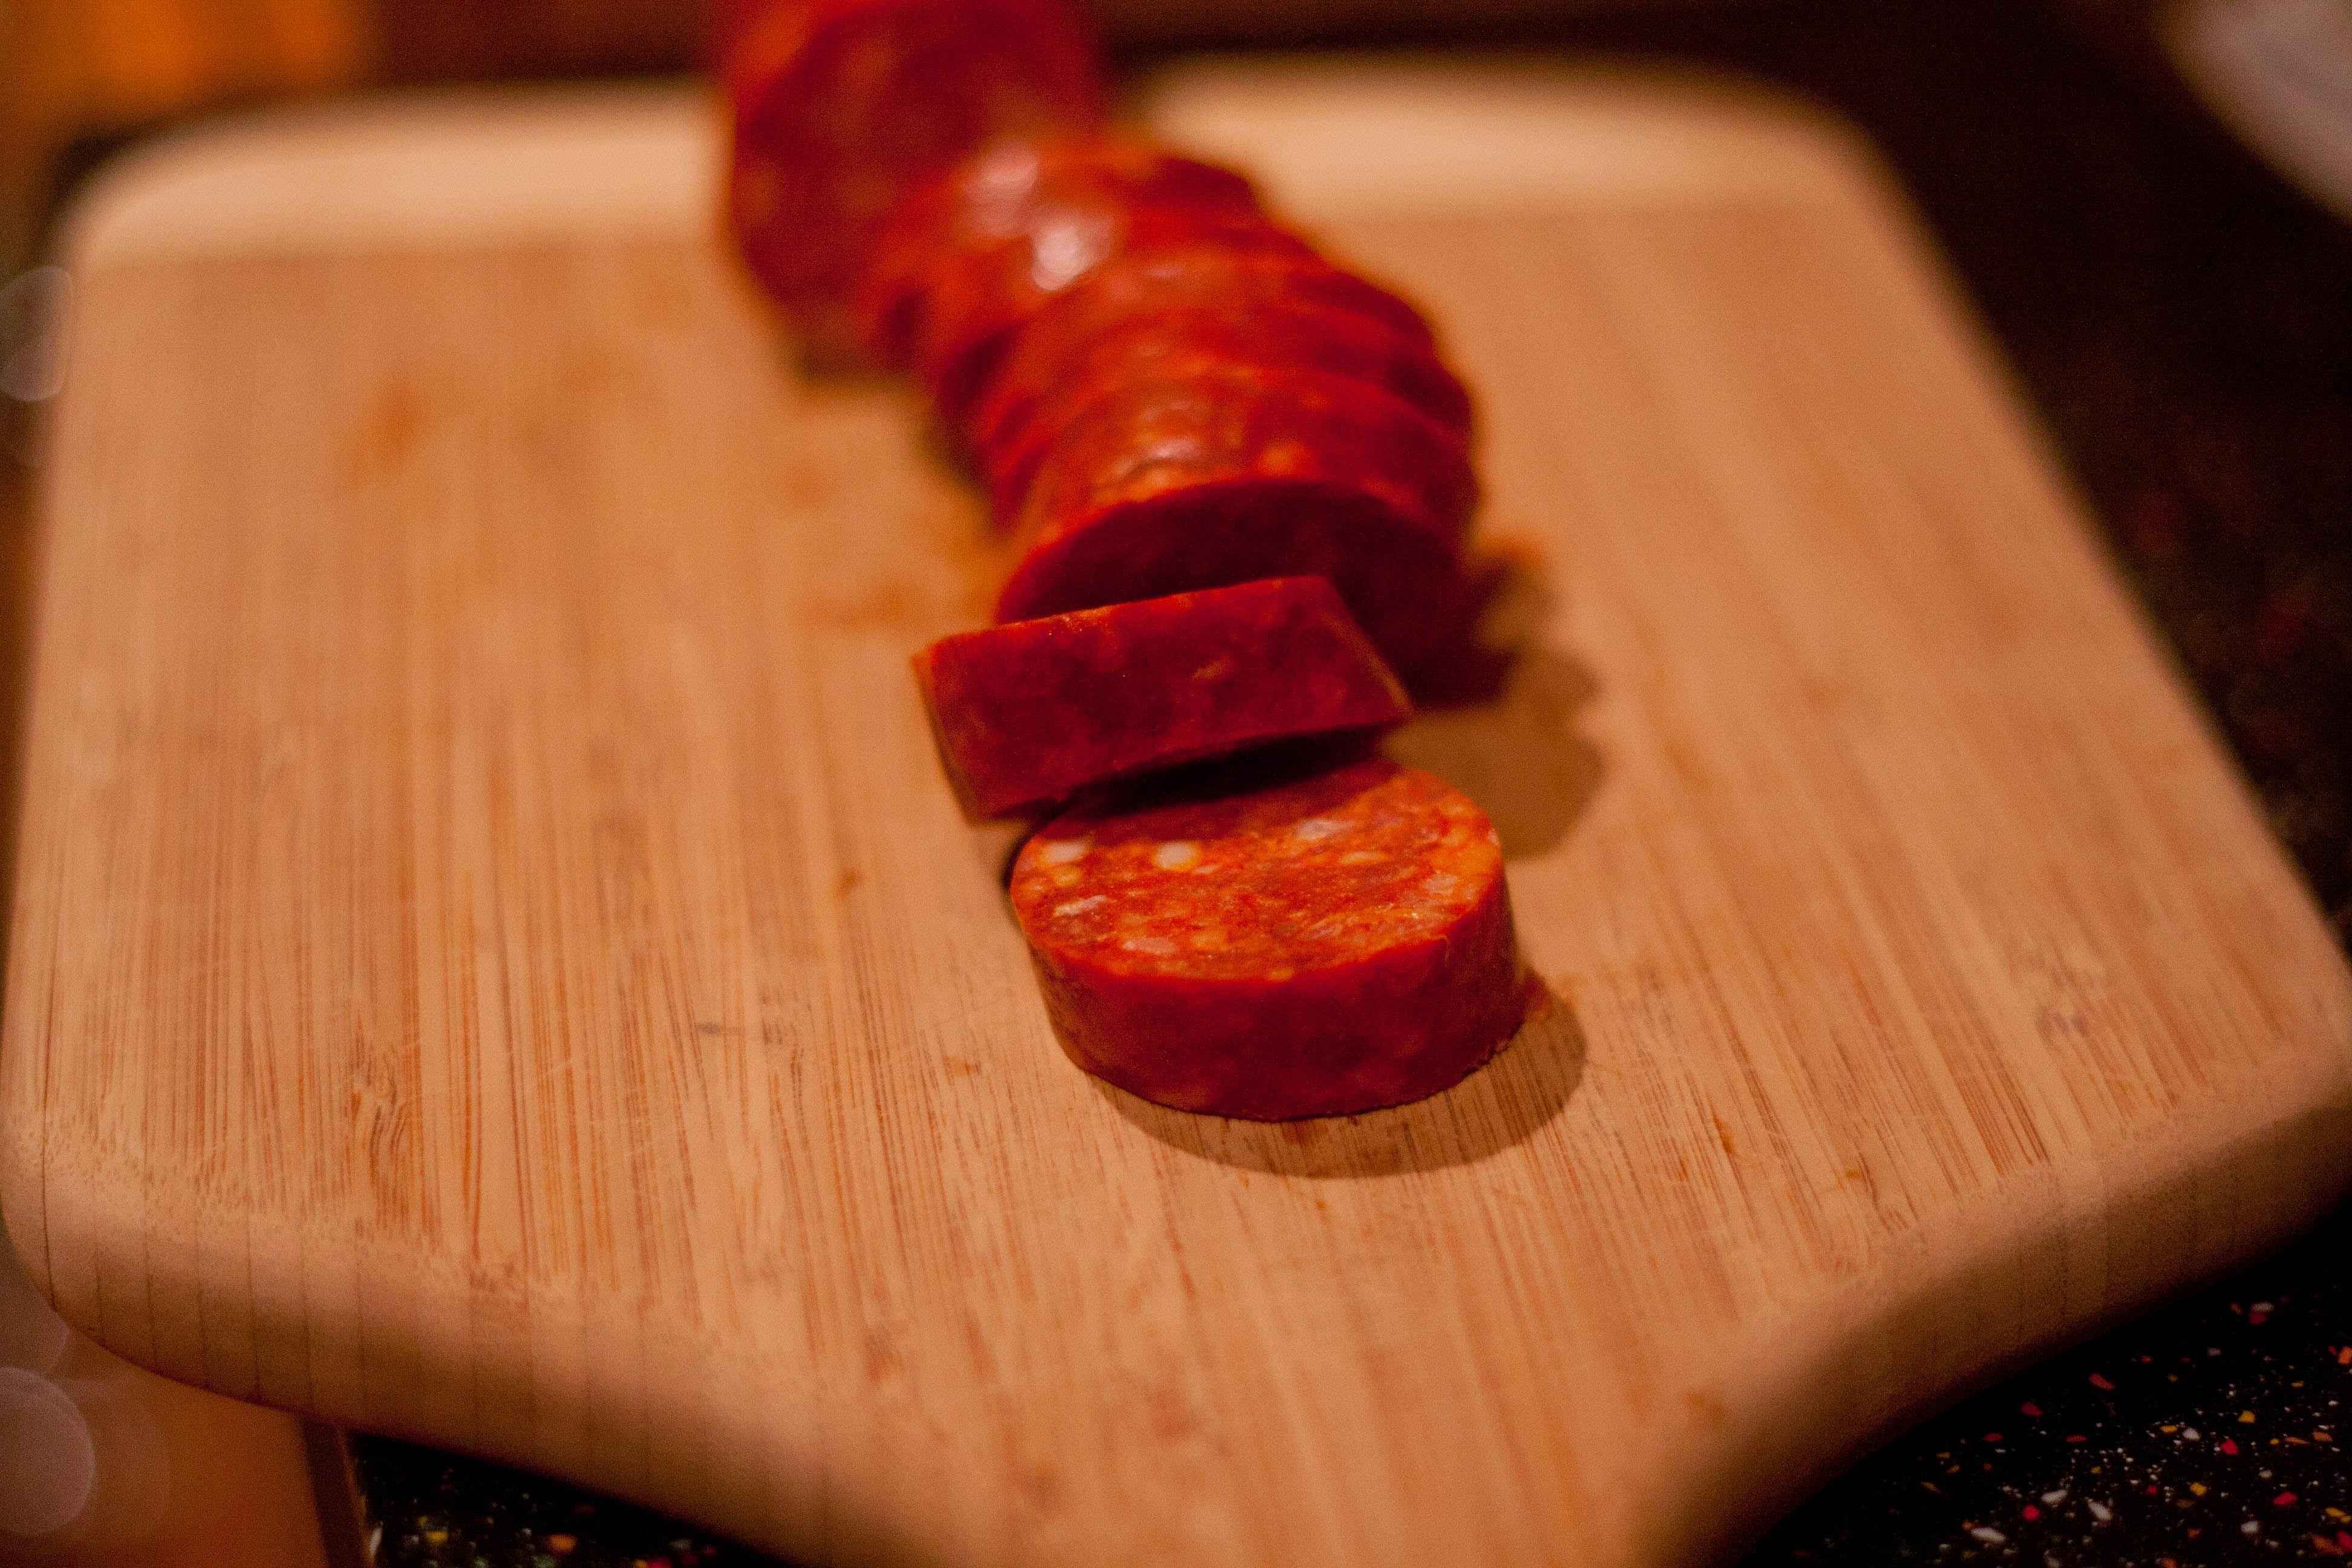 Chorizo Al Vino Tinto Chorizo In Red Wine Recipes Tapas Chorizo